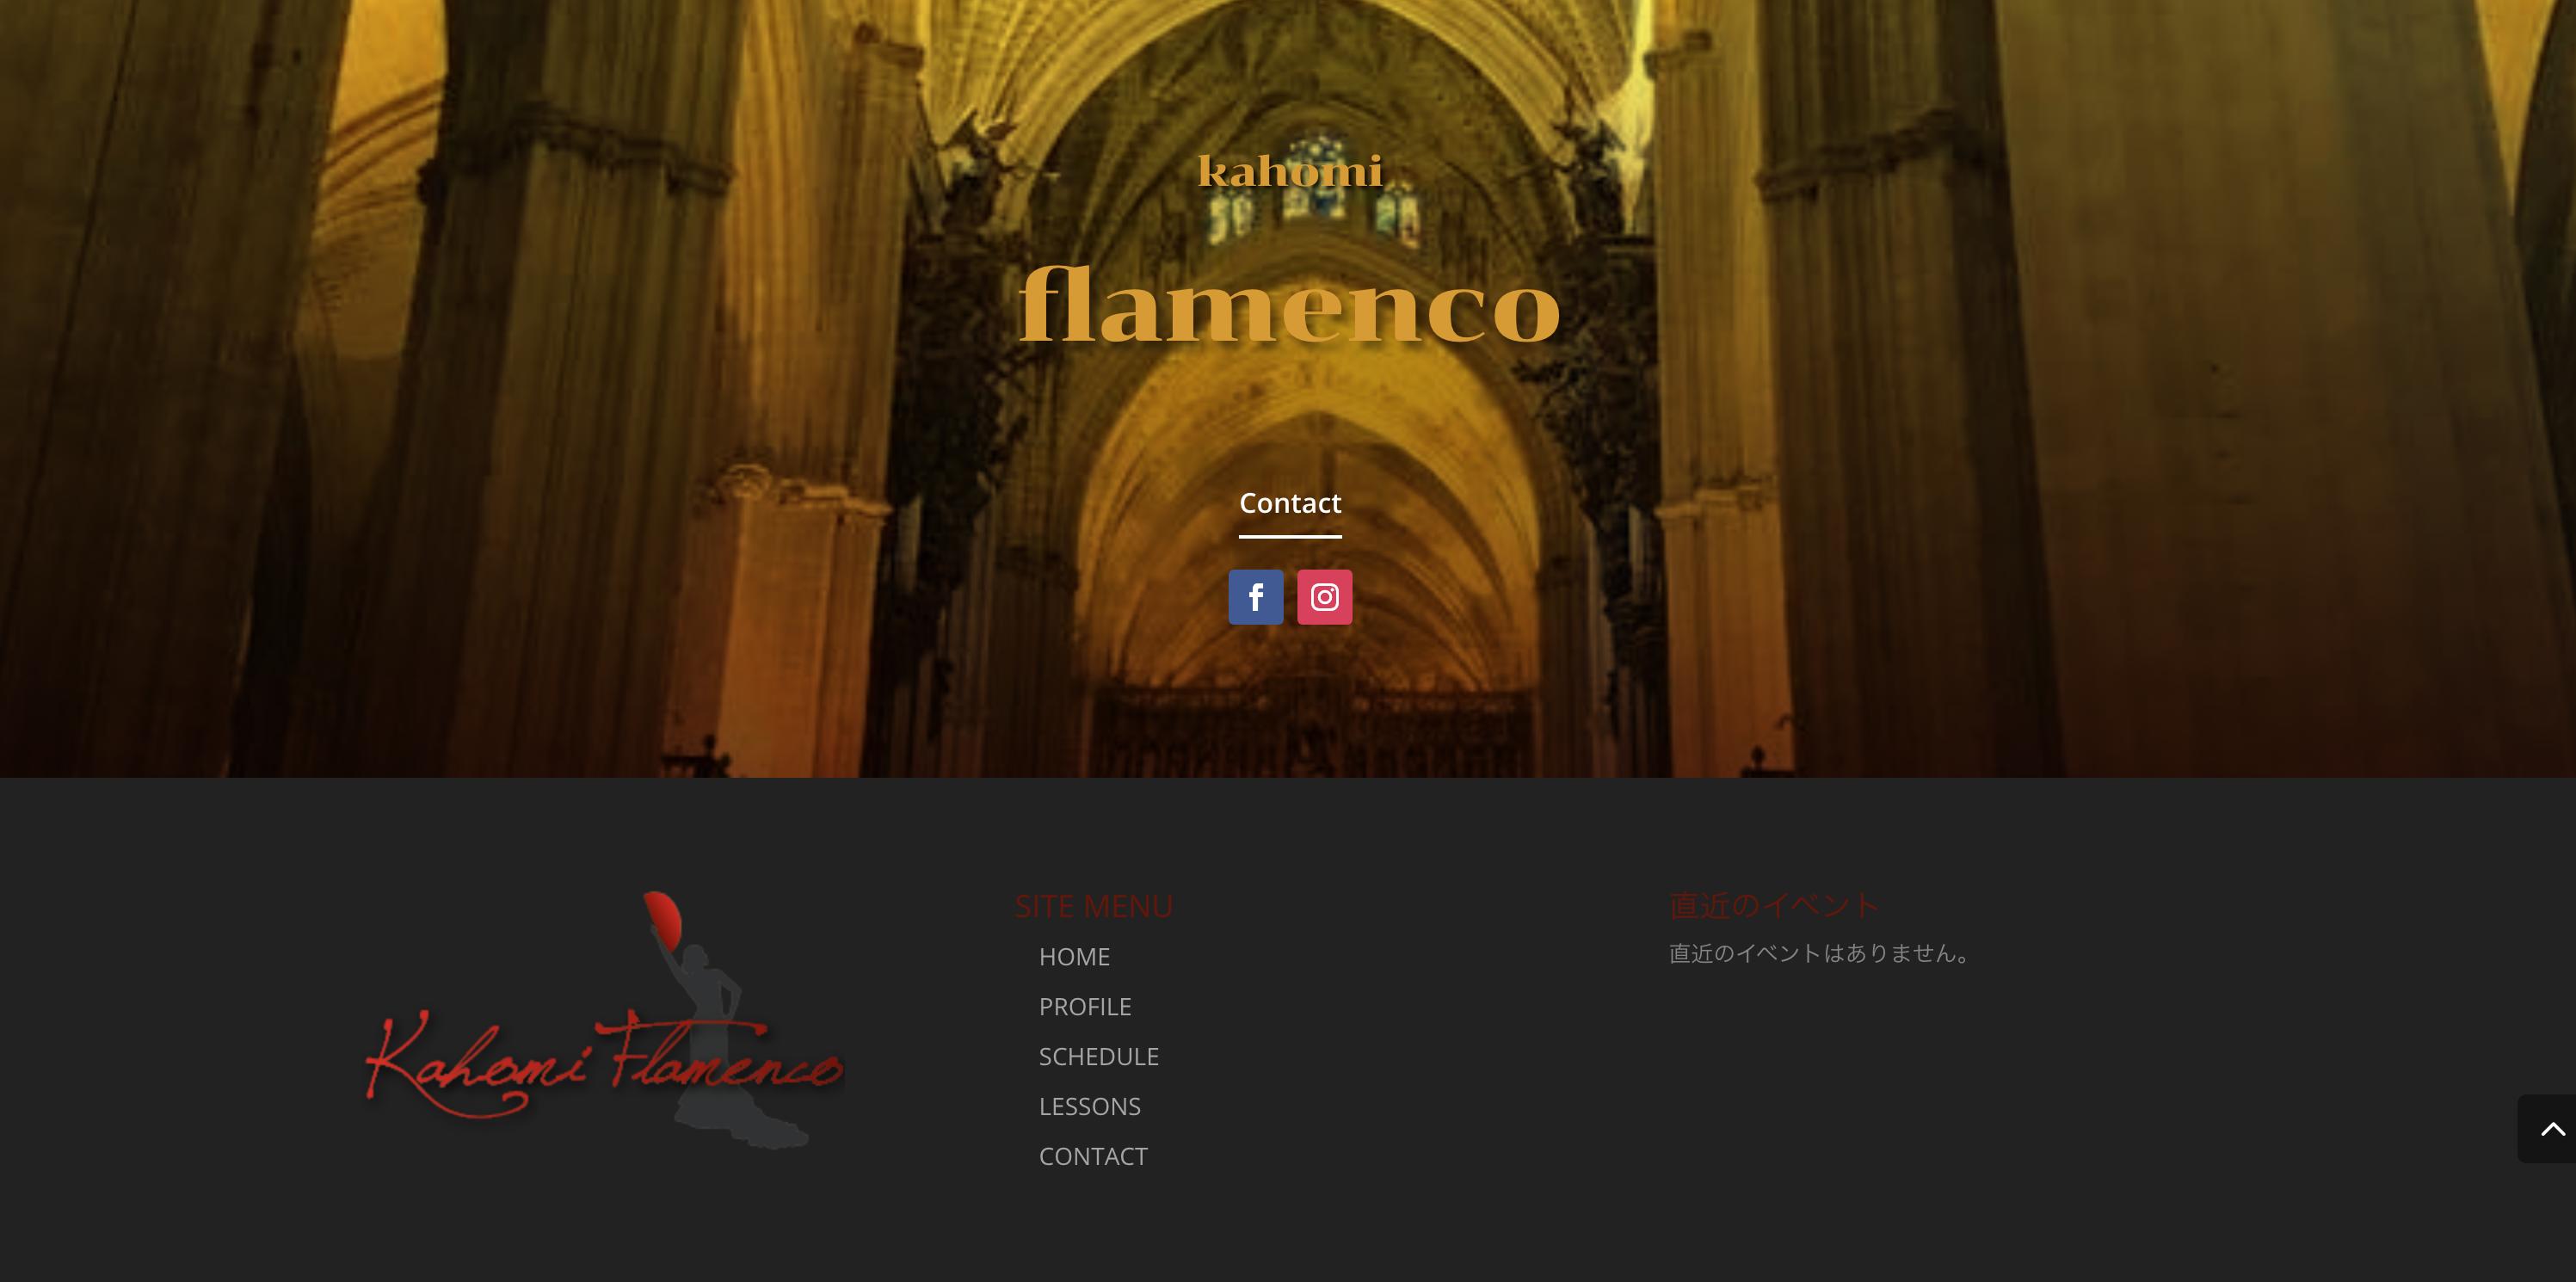 kahomi flamenco Webサイトリニューアル